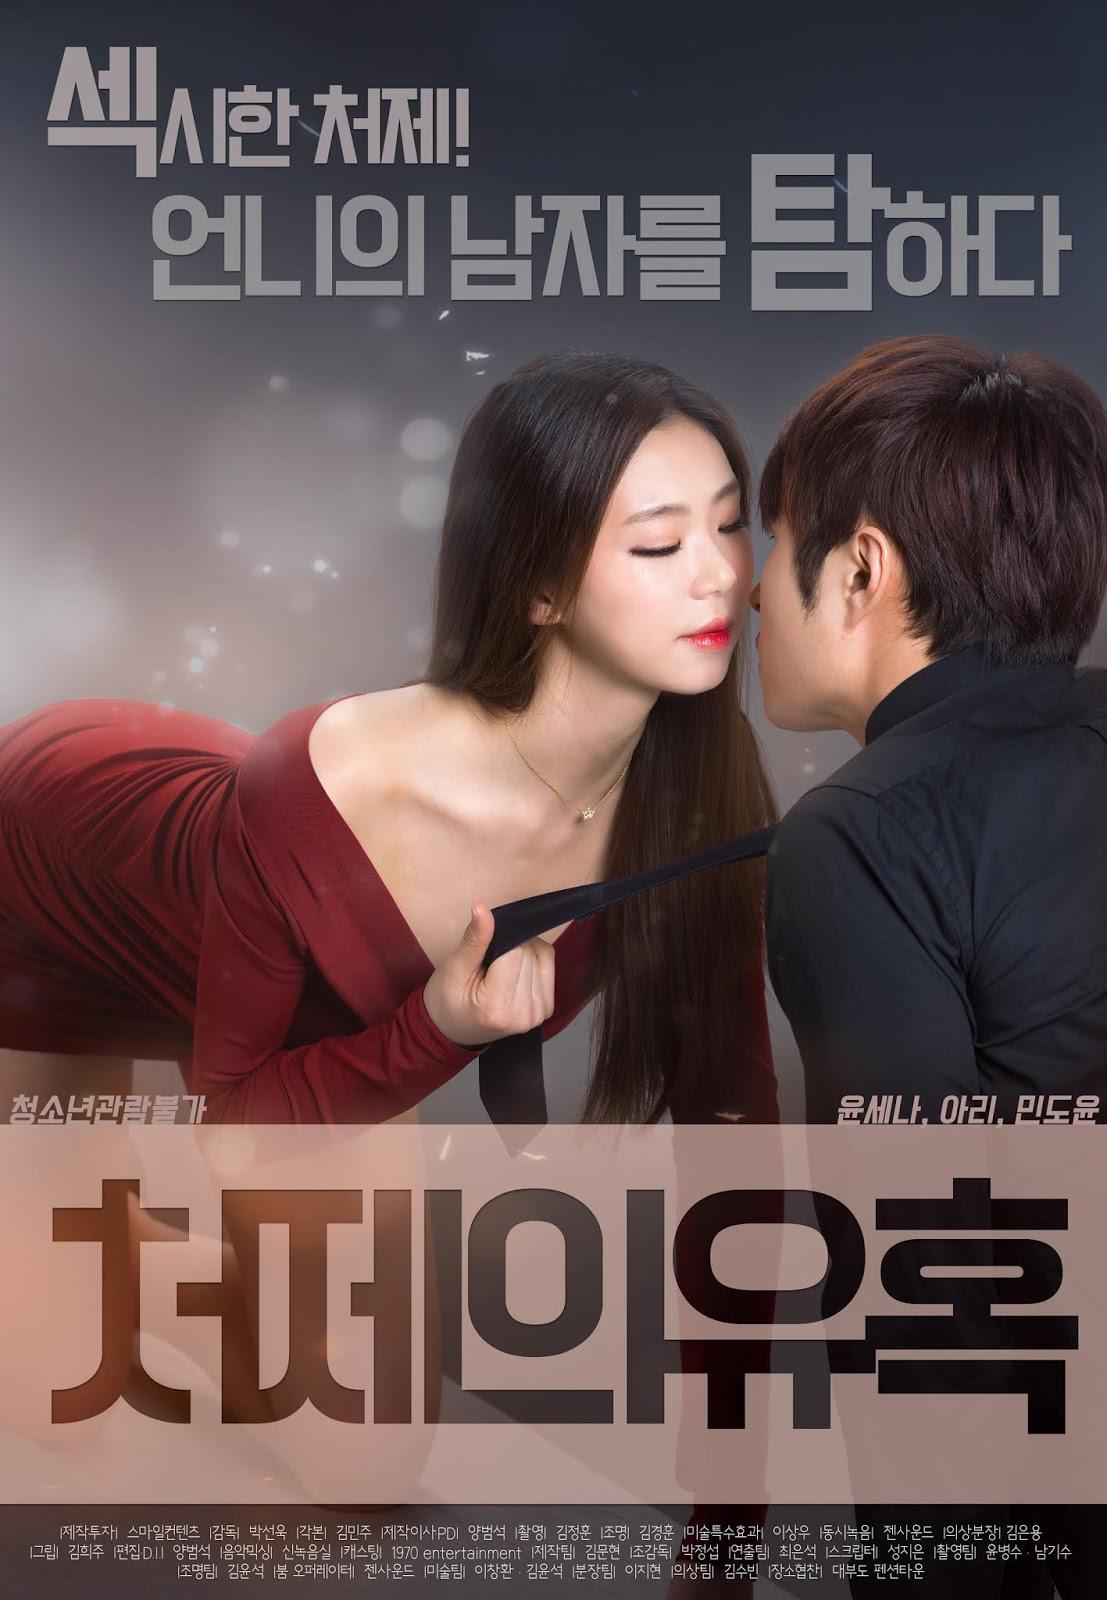 Sister In Laws Seduction (Temptation) Full Korea Adult 18+ Movie Online